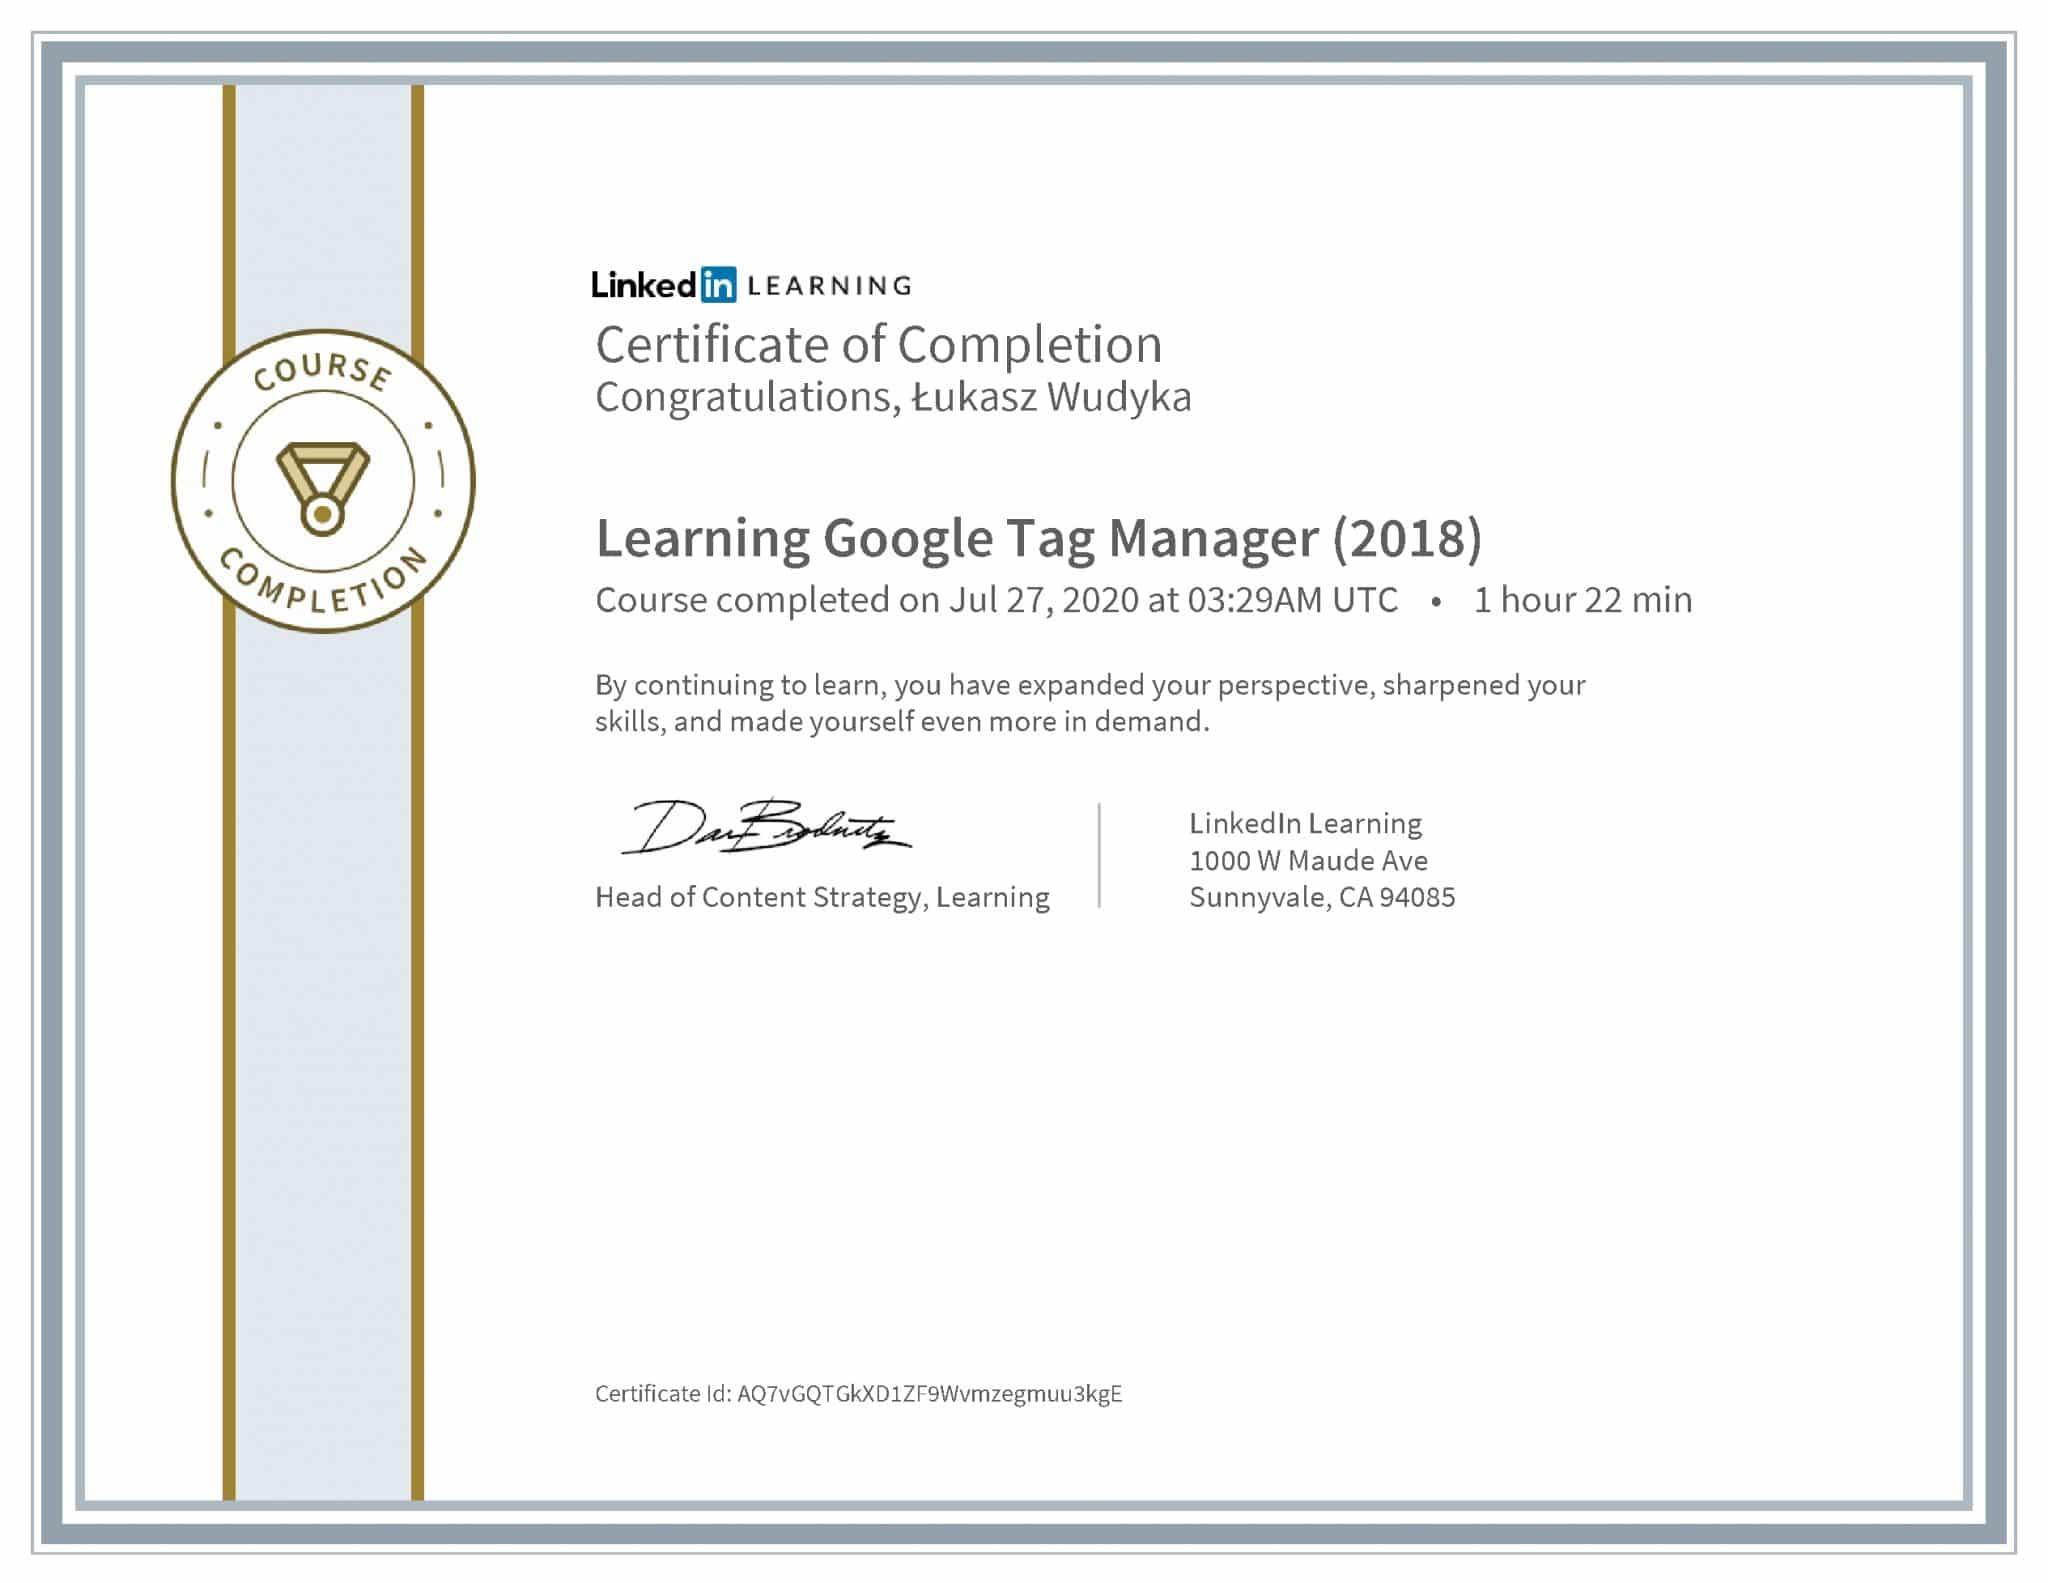 Łukasz Wudyka certyfikat LinkedIn Learning Google Tag Manager (2018)